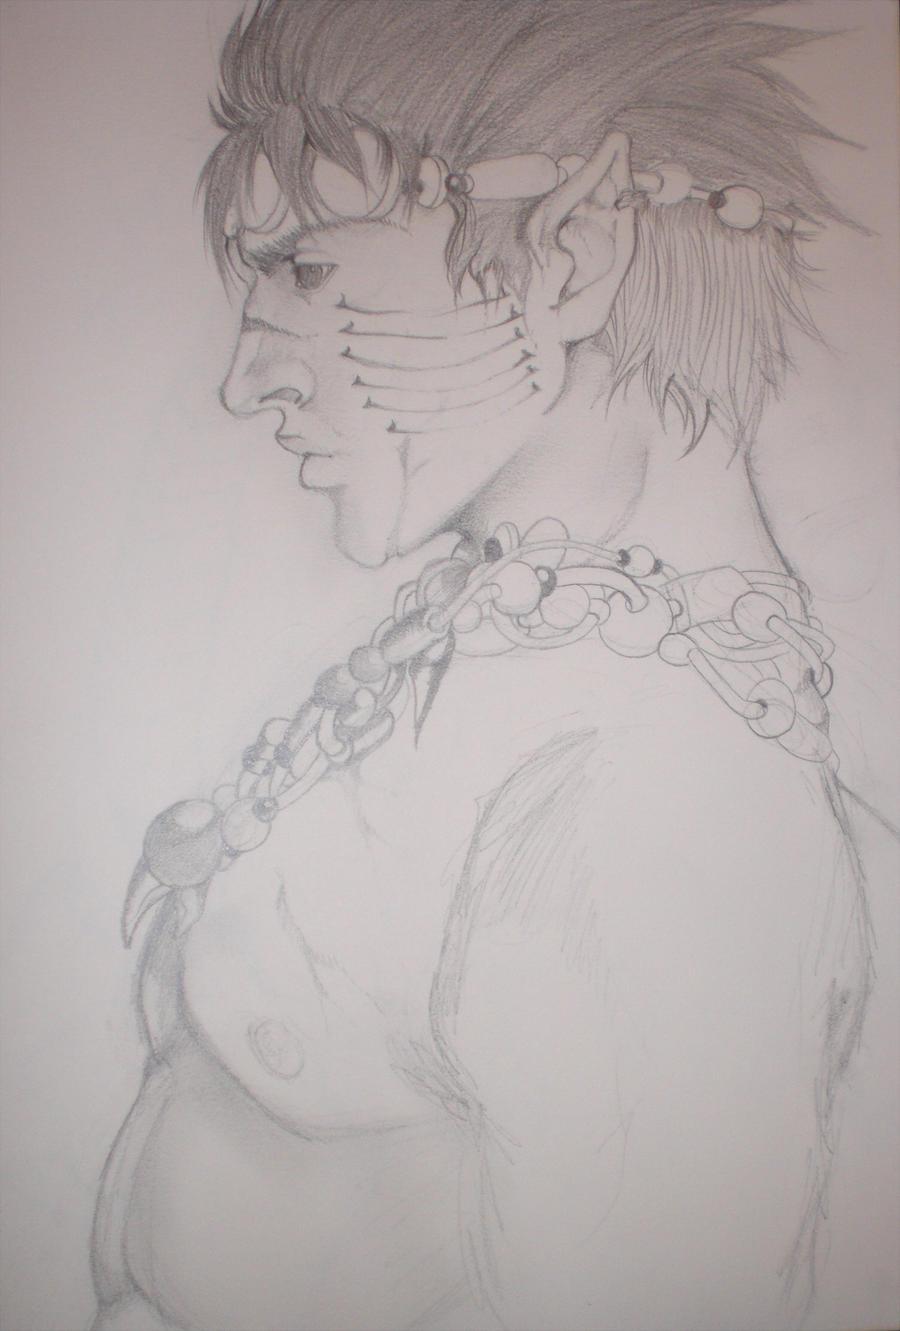 Ailin-Sketch by MidnightZone